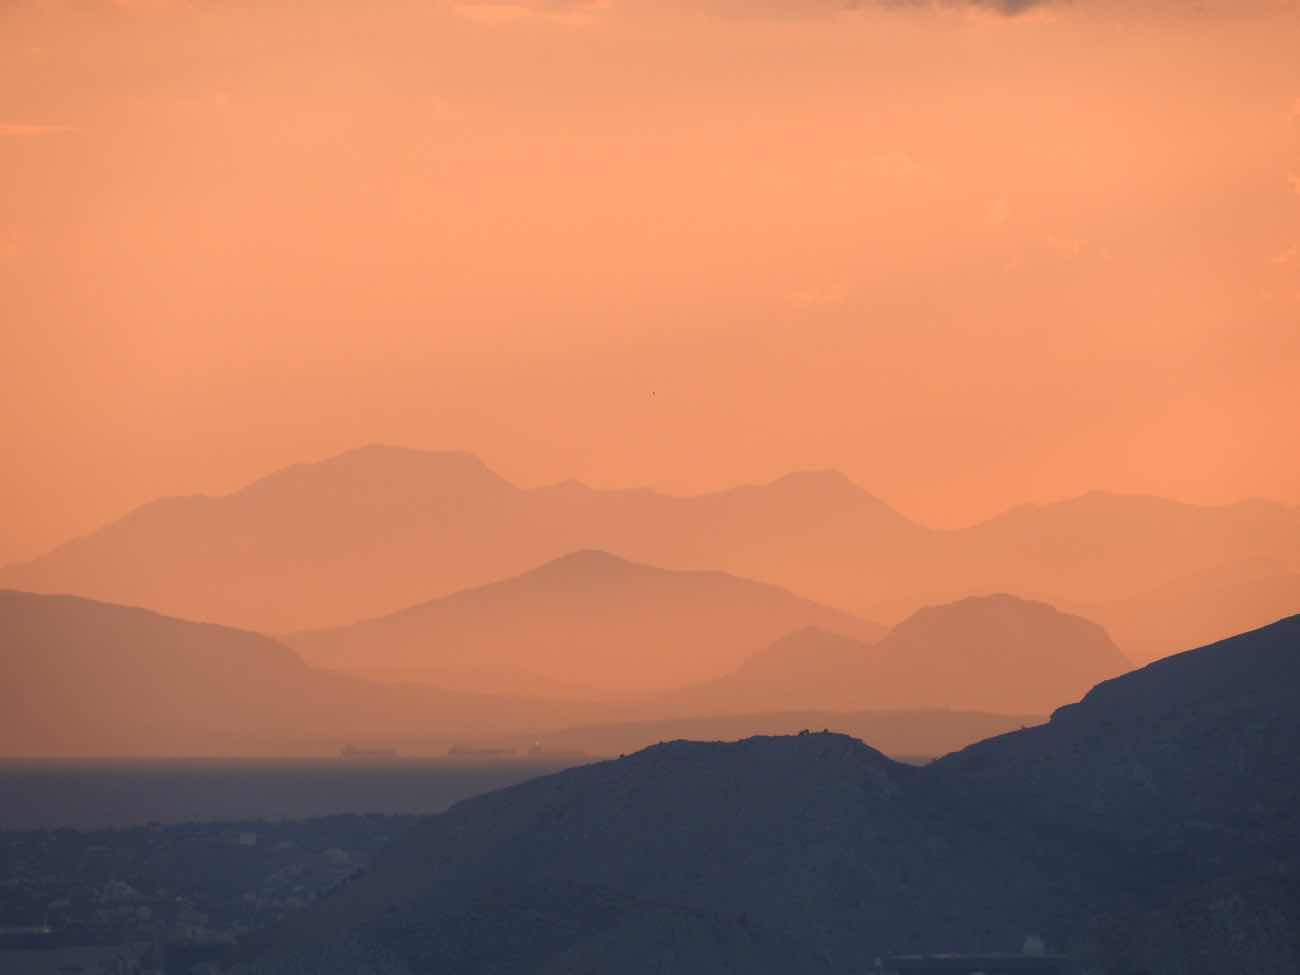 greece itinerary travel blog athens sunset